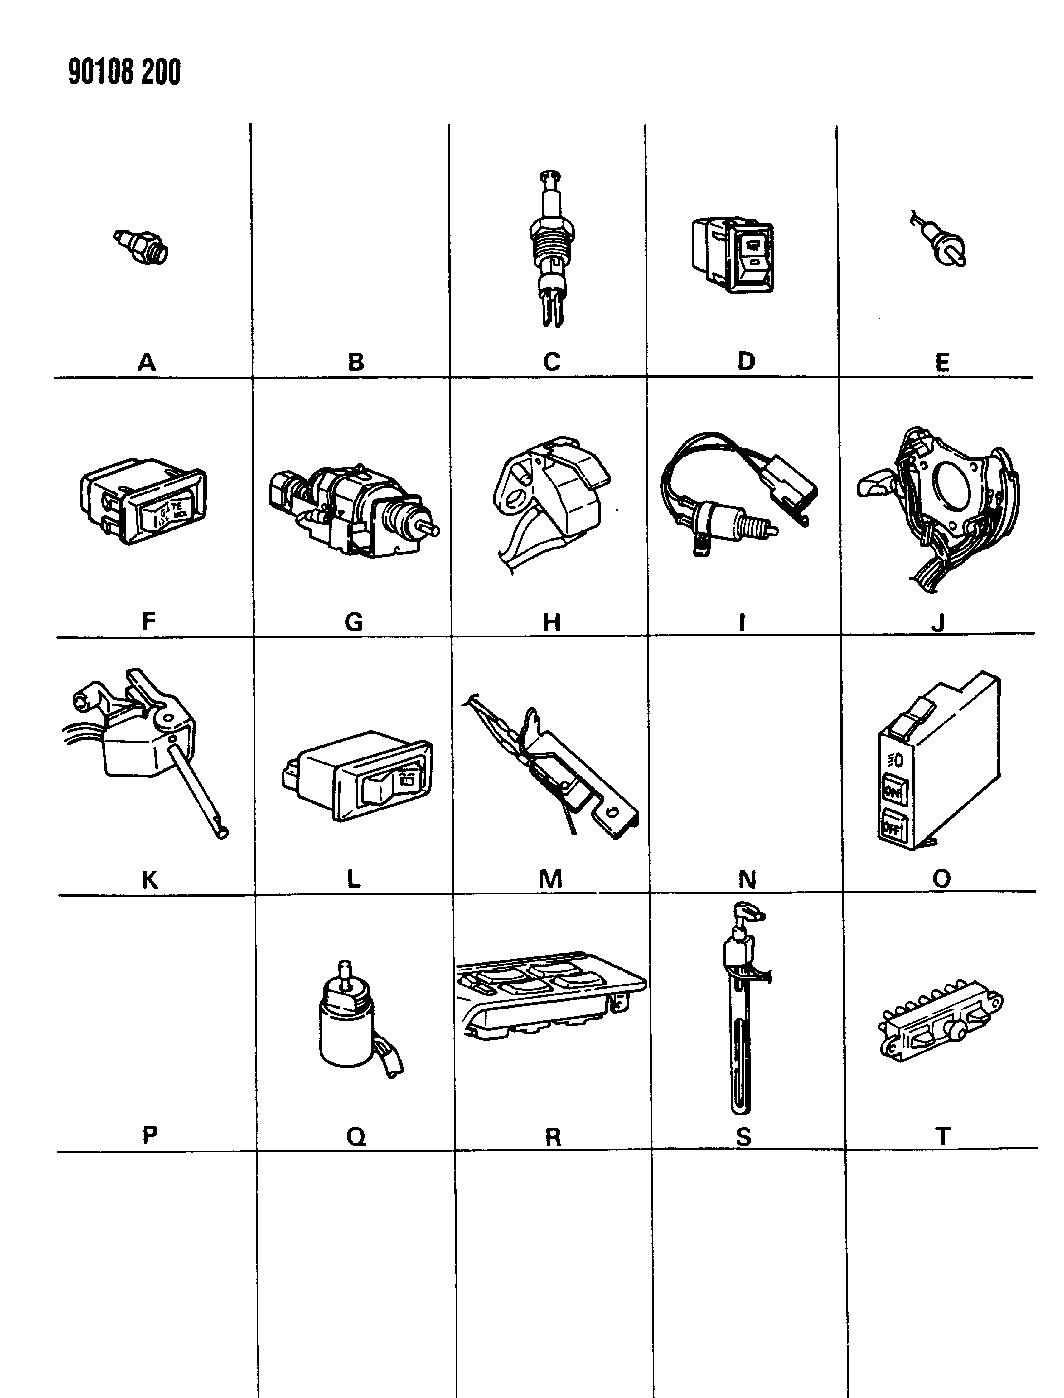 1990 dodge omni switches